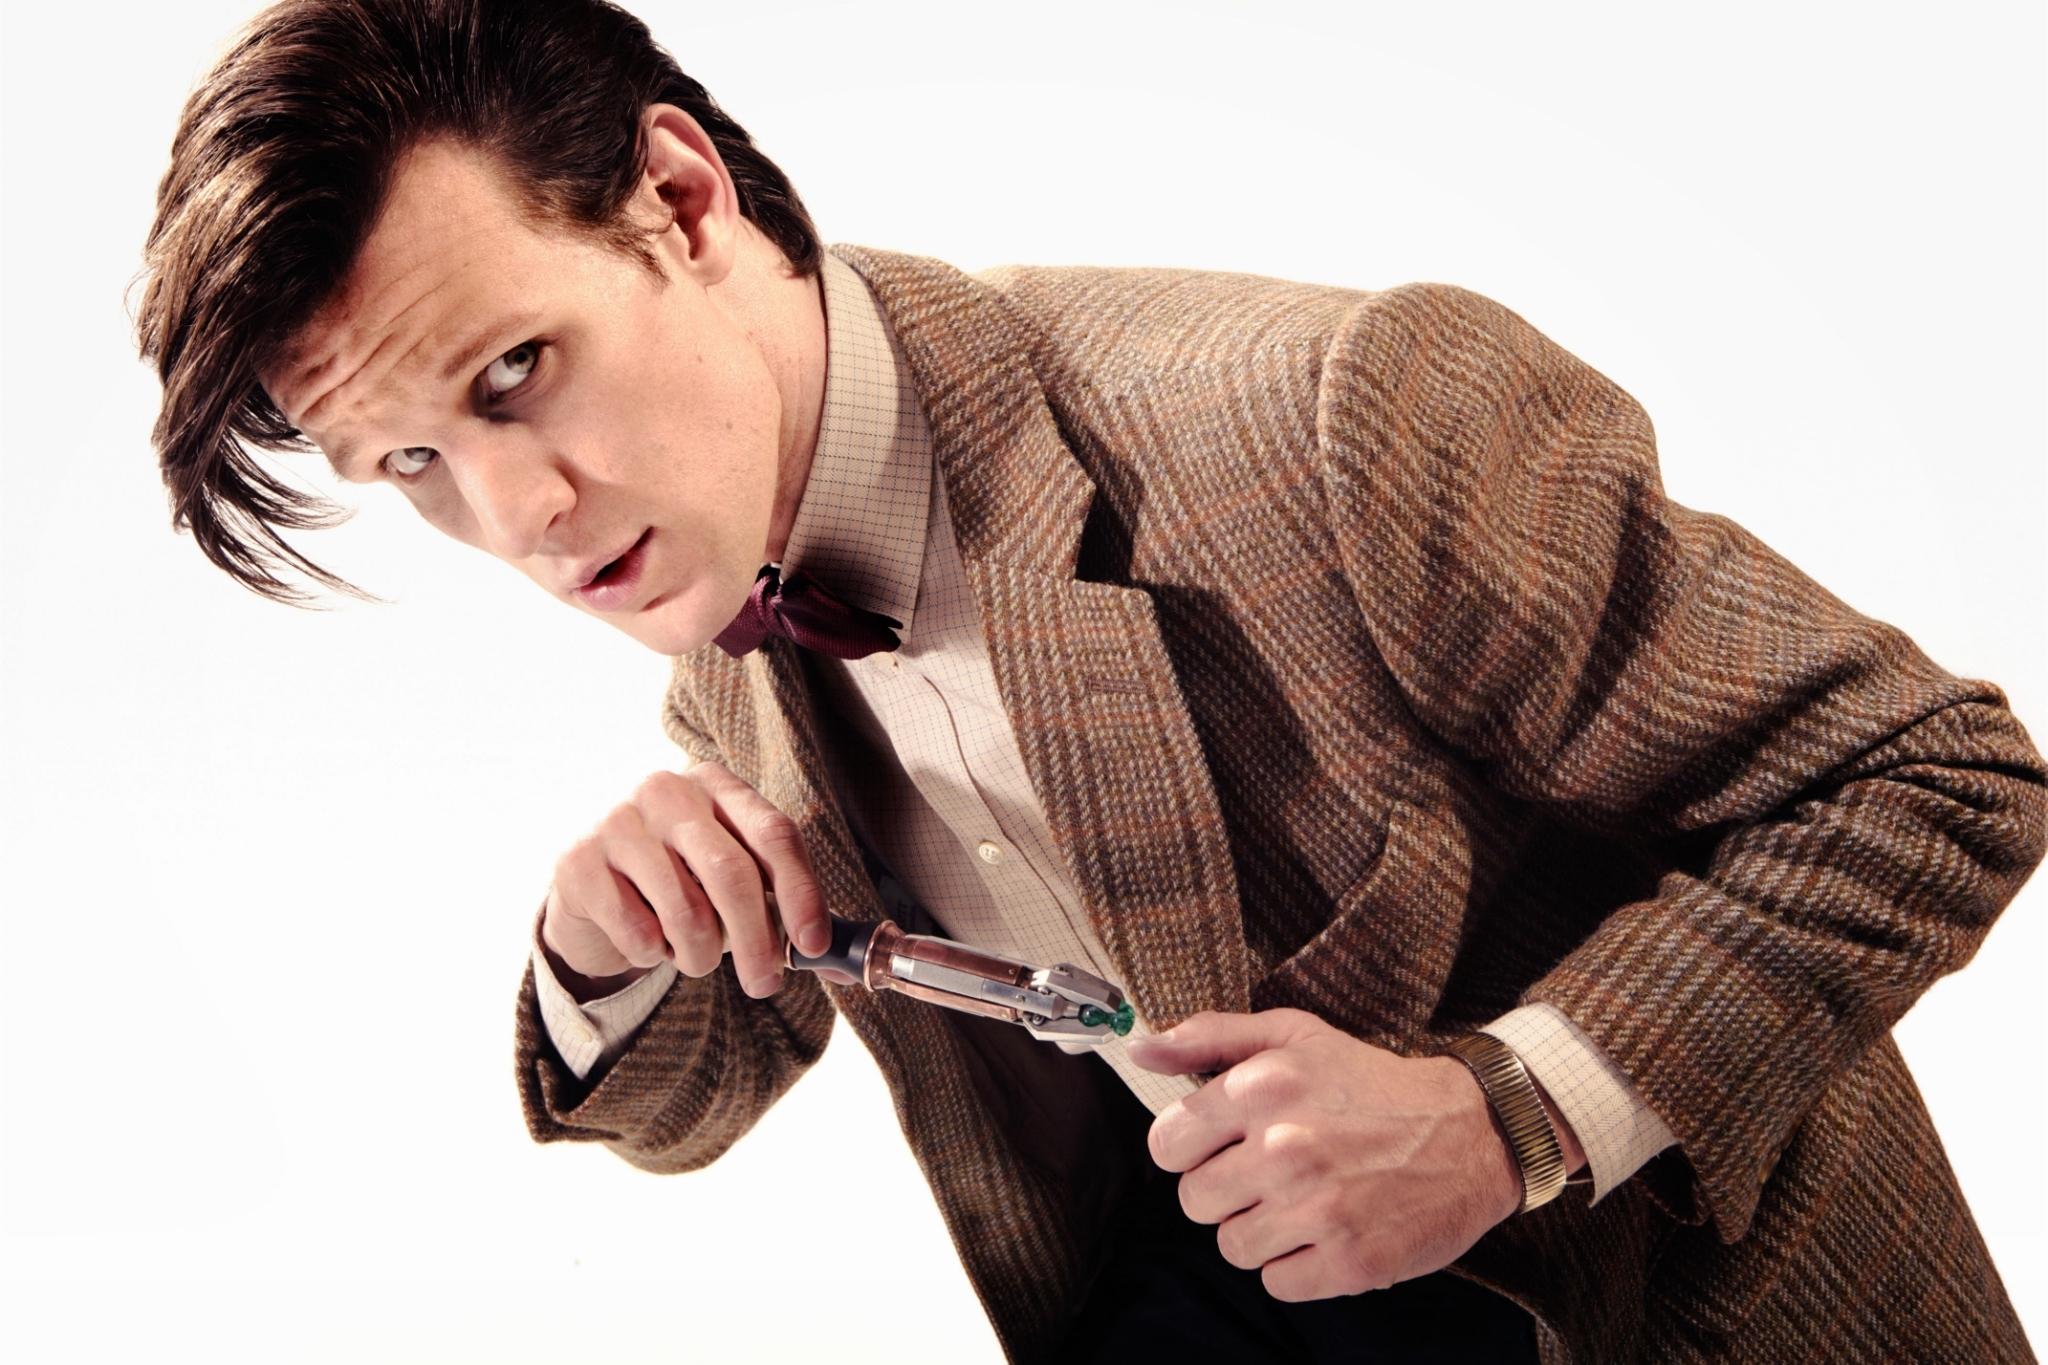 Wallpaper doctor who doctor who matt smith matt smith male white 2048x1365